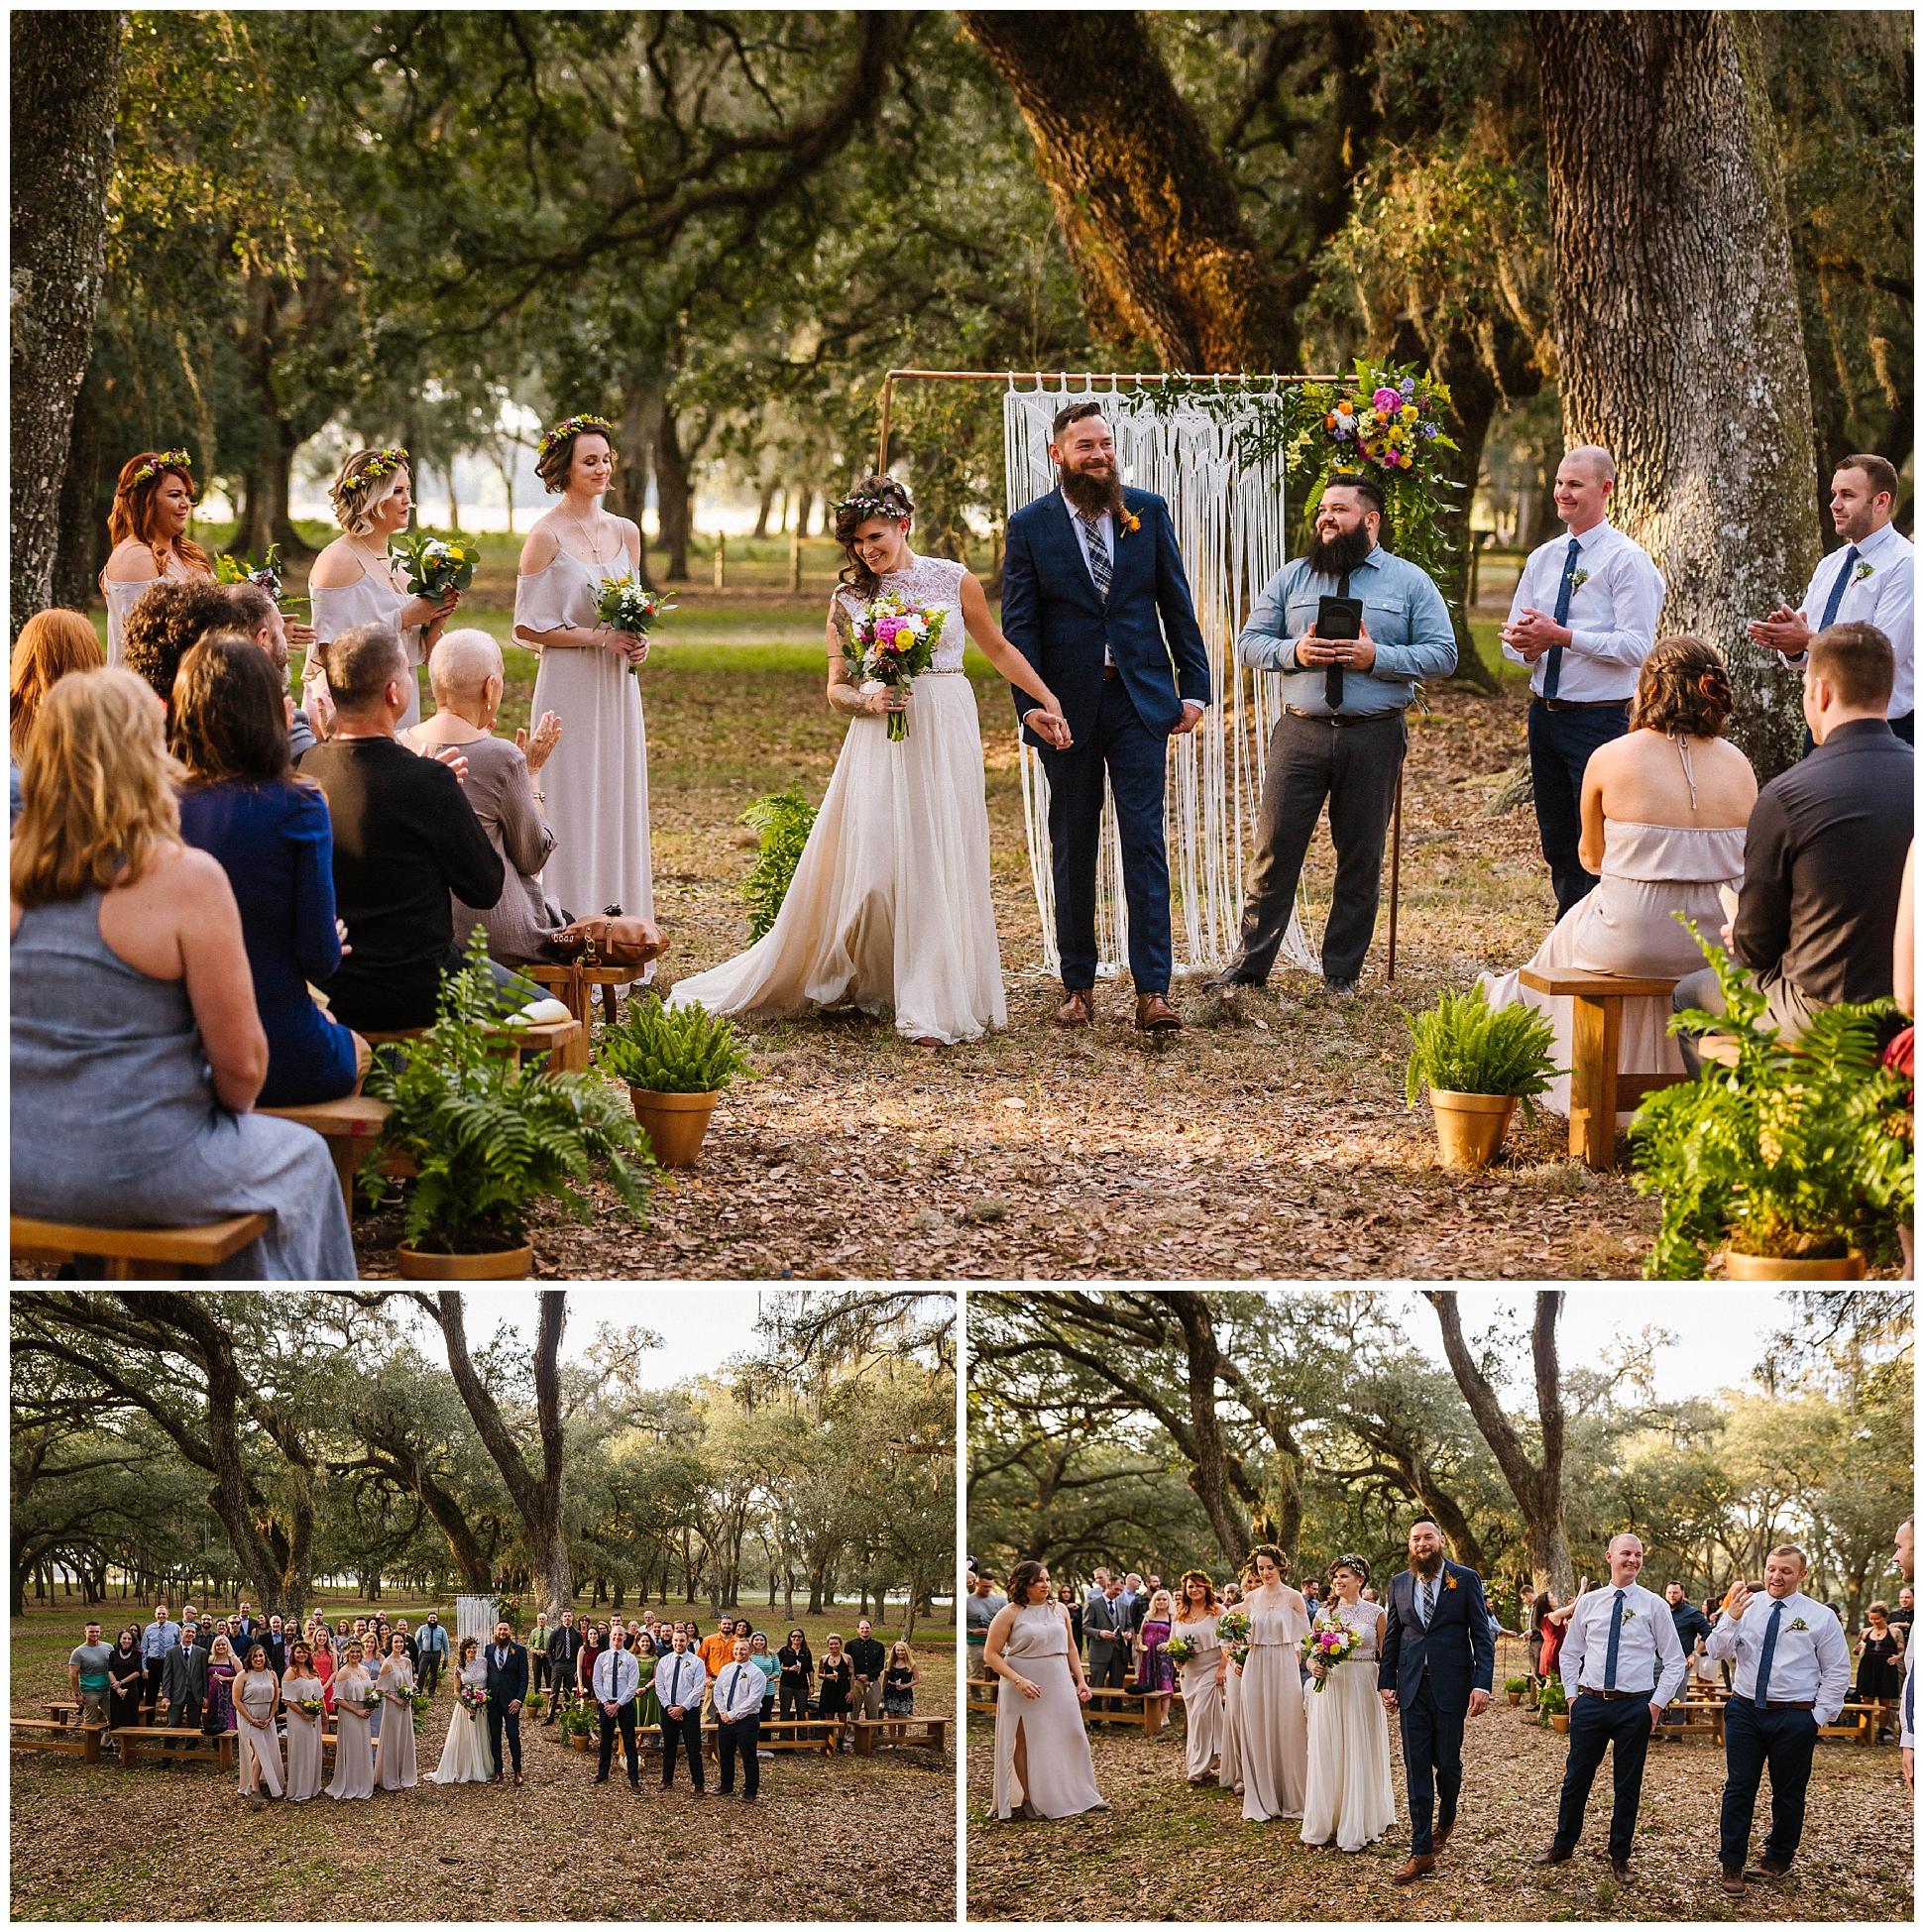 magical-outdoor-florida-wedding-smoke-bombs-flowers-crown-beard_0032.jpg